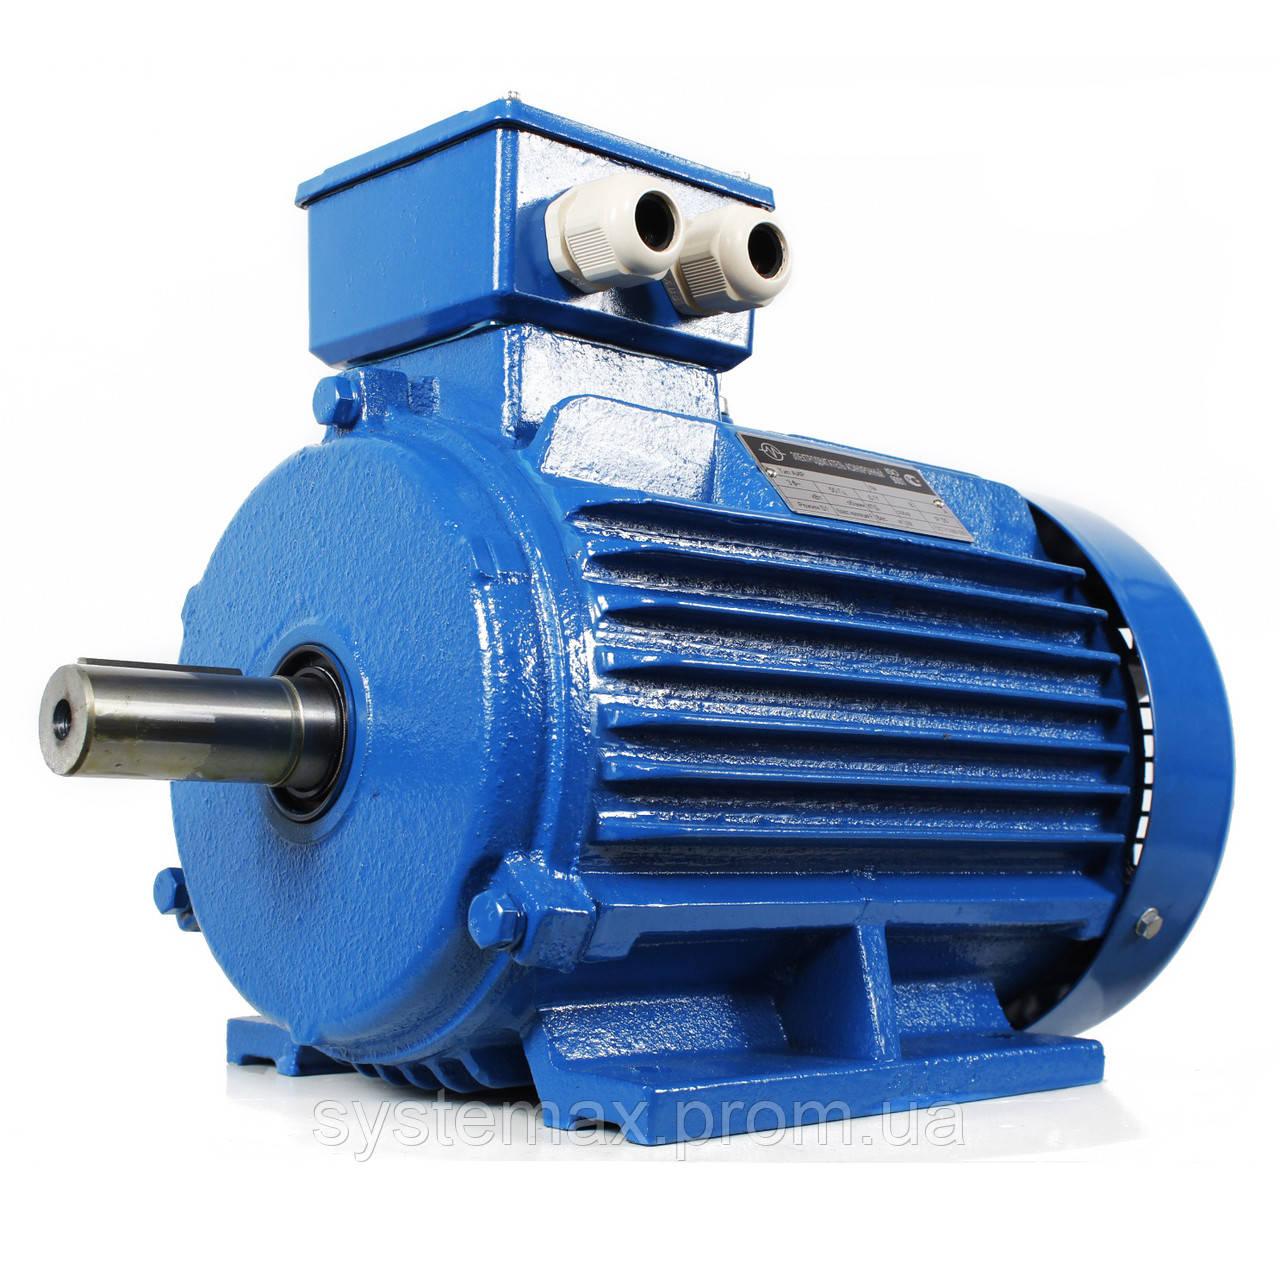 Электродвигатель АИР160S8 (АИР 160 S8) 7,5 кВт 750 об/мин